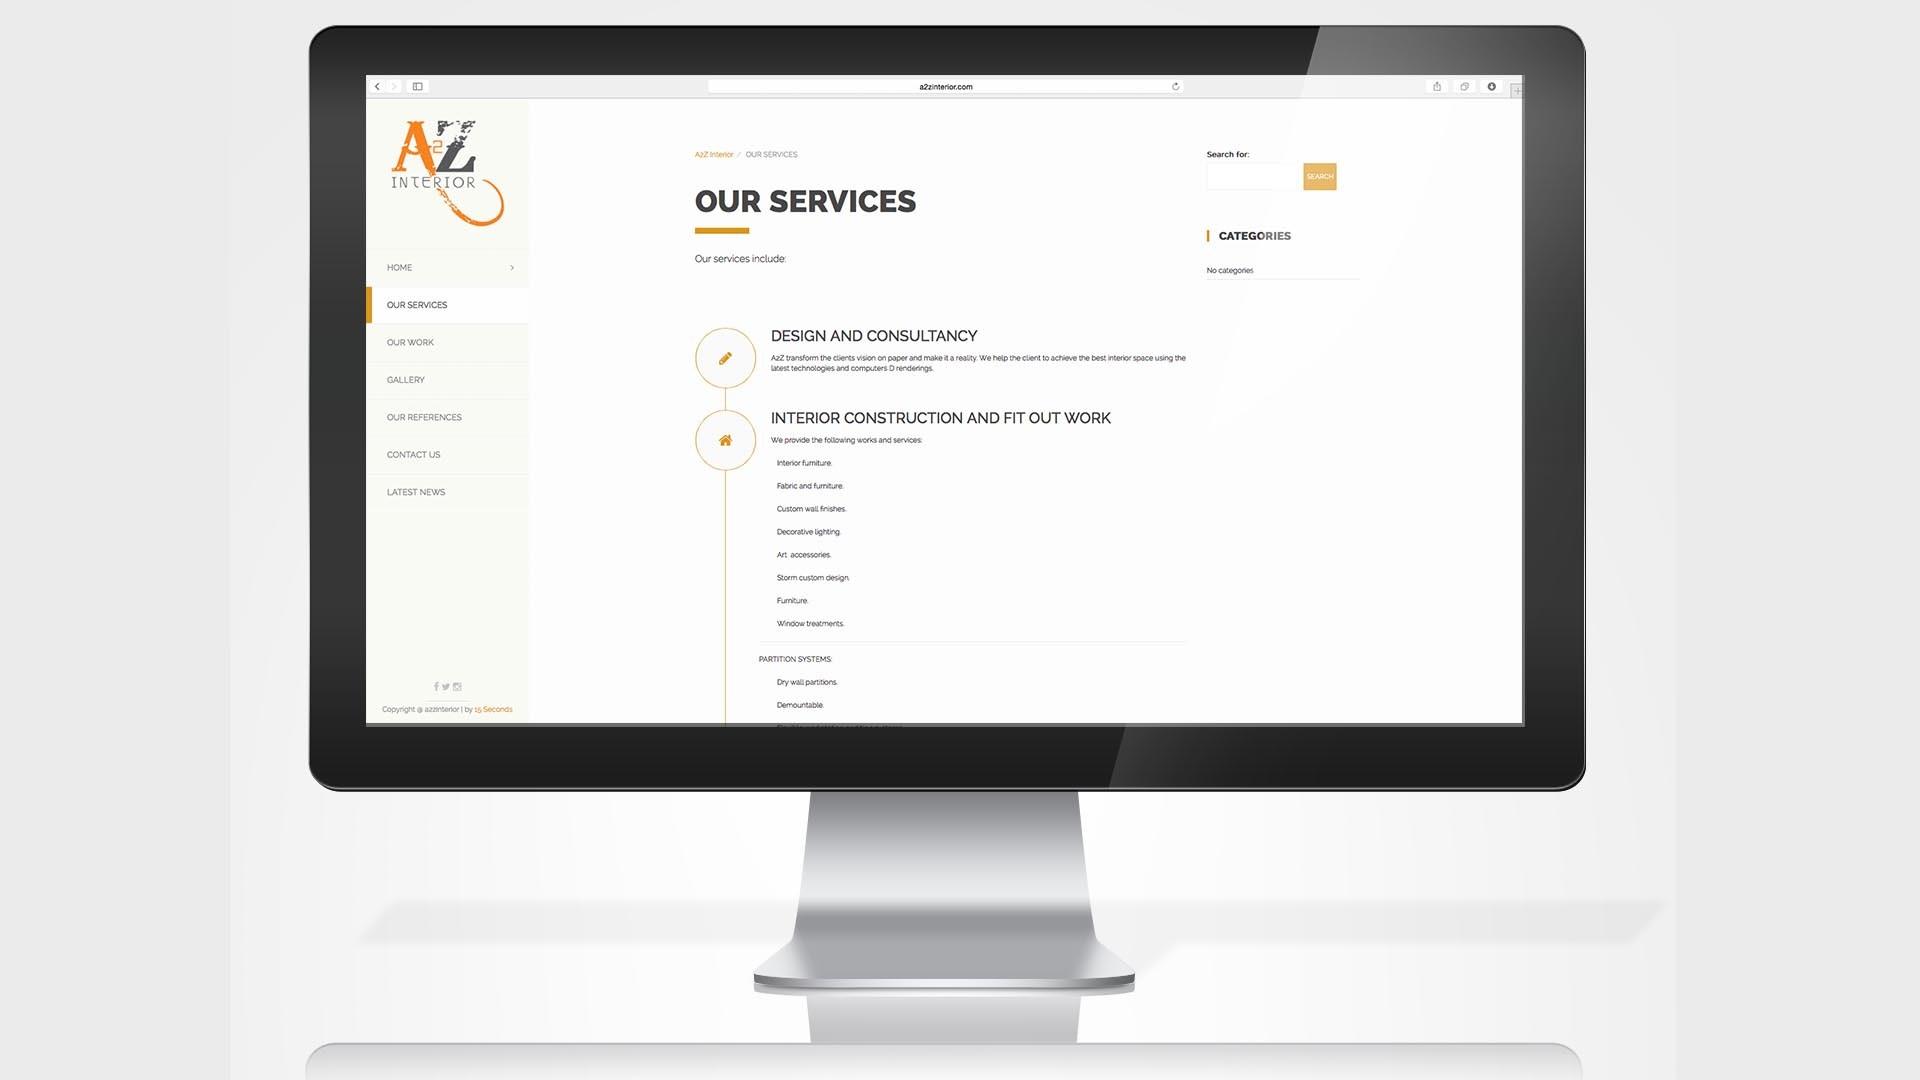 a2z-interiors-website-services